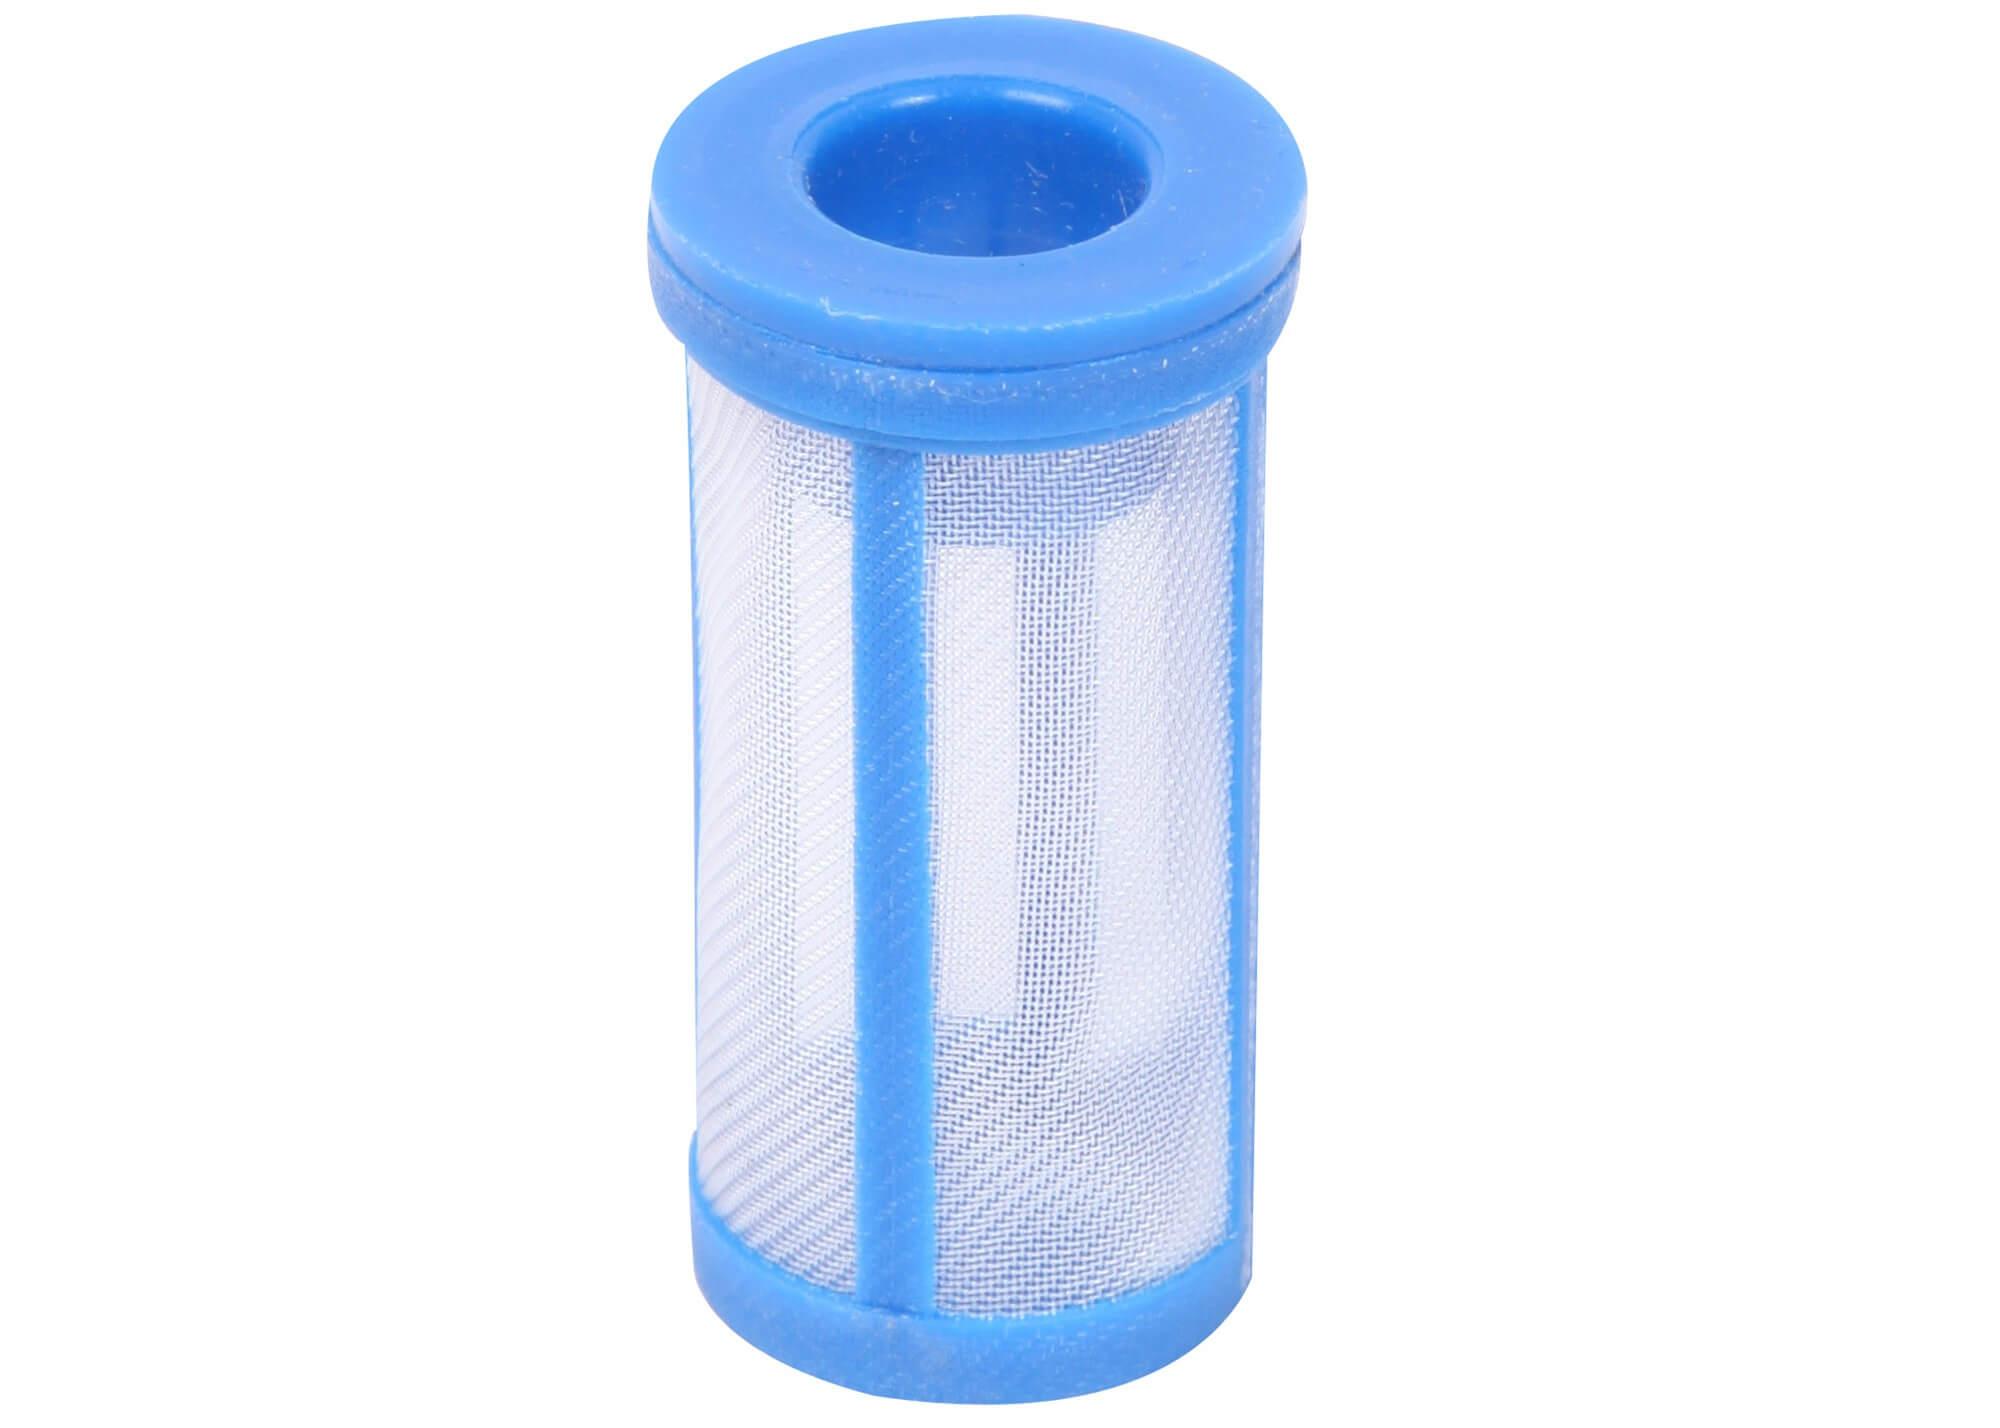 Filtre de tube purgeur gpm ptm piscines waterair for Filtre piscine waterair